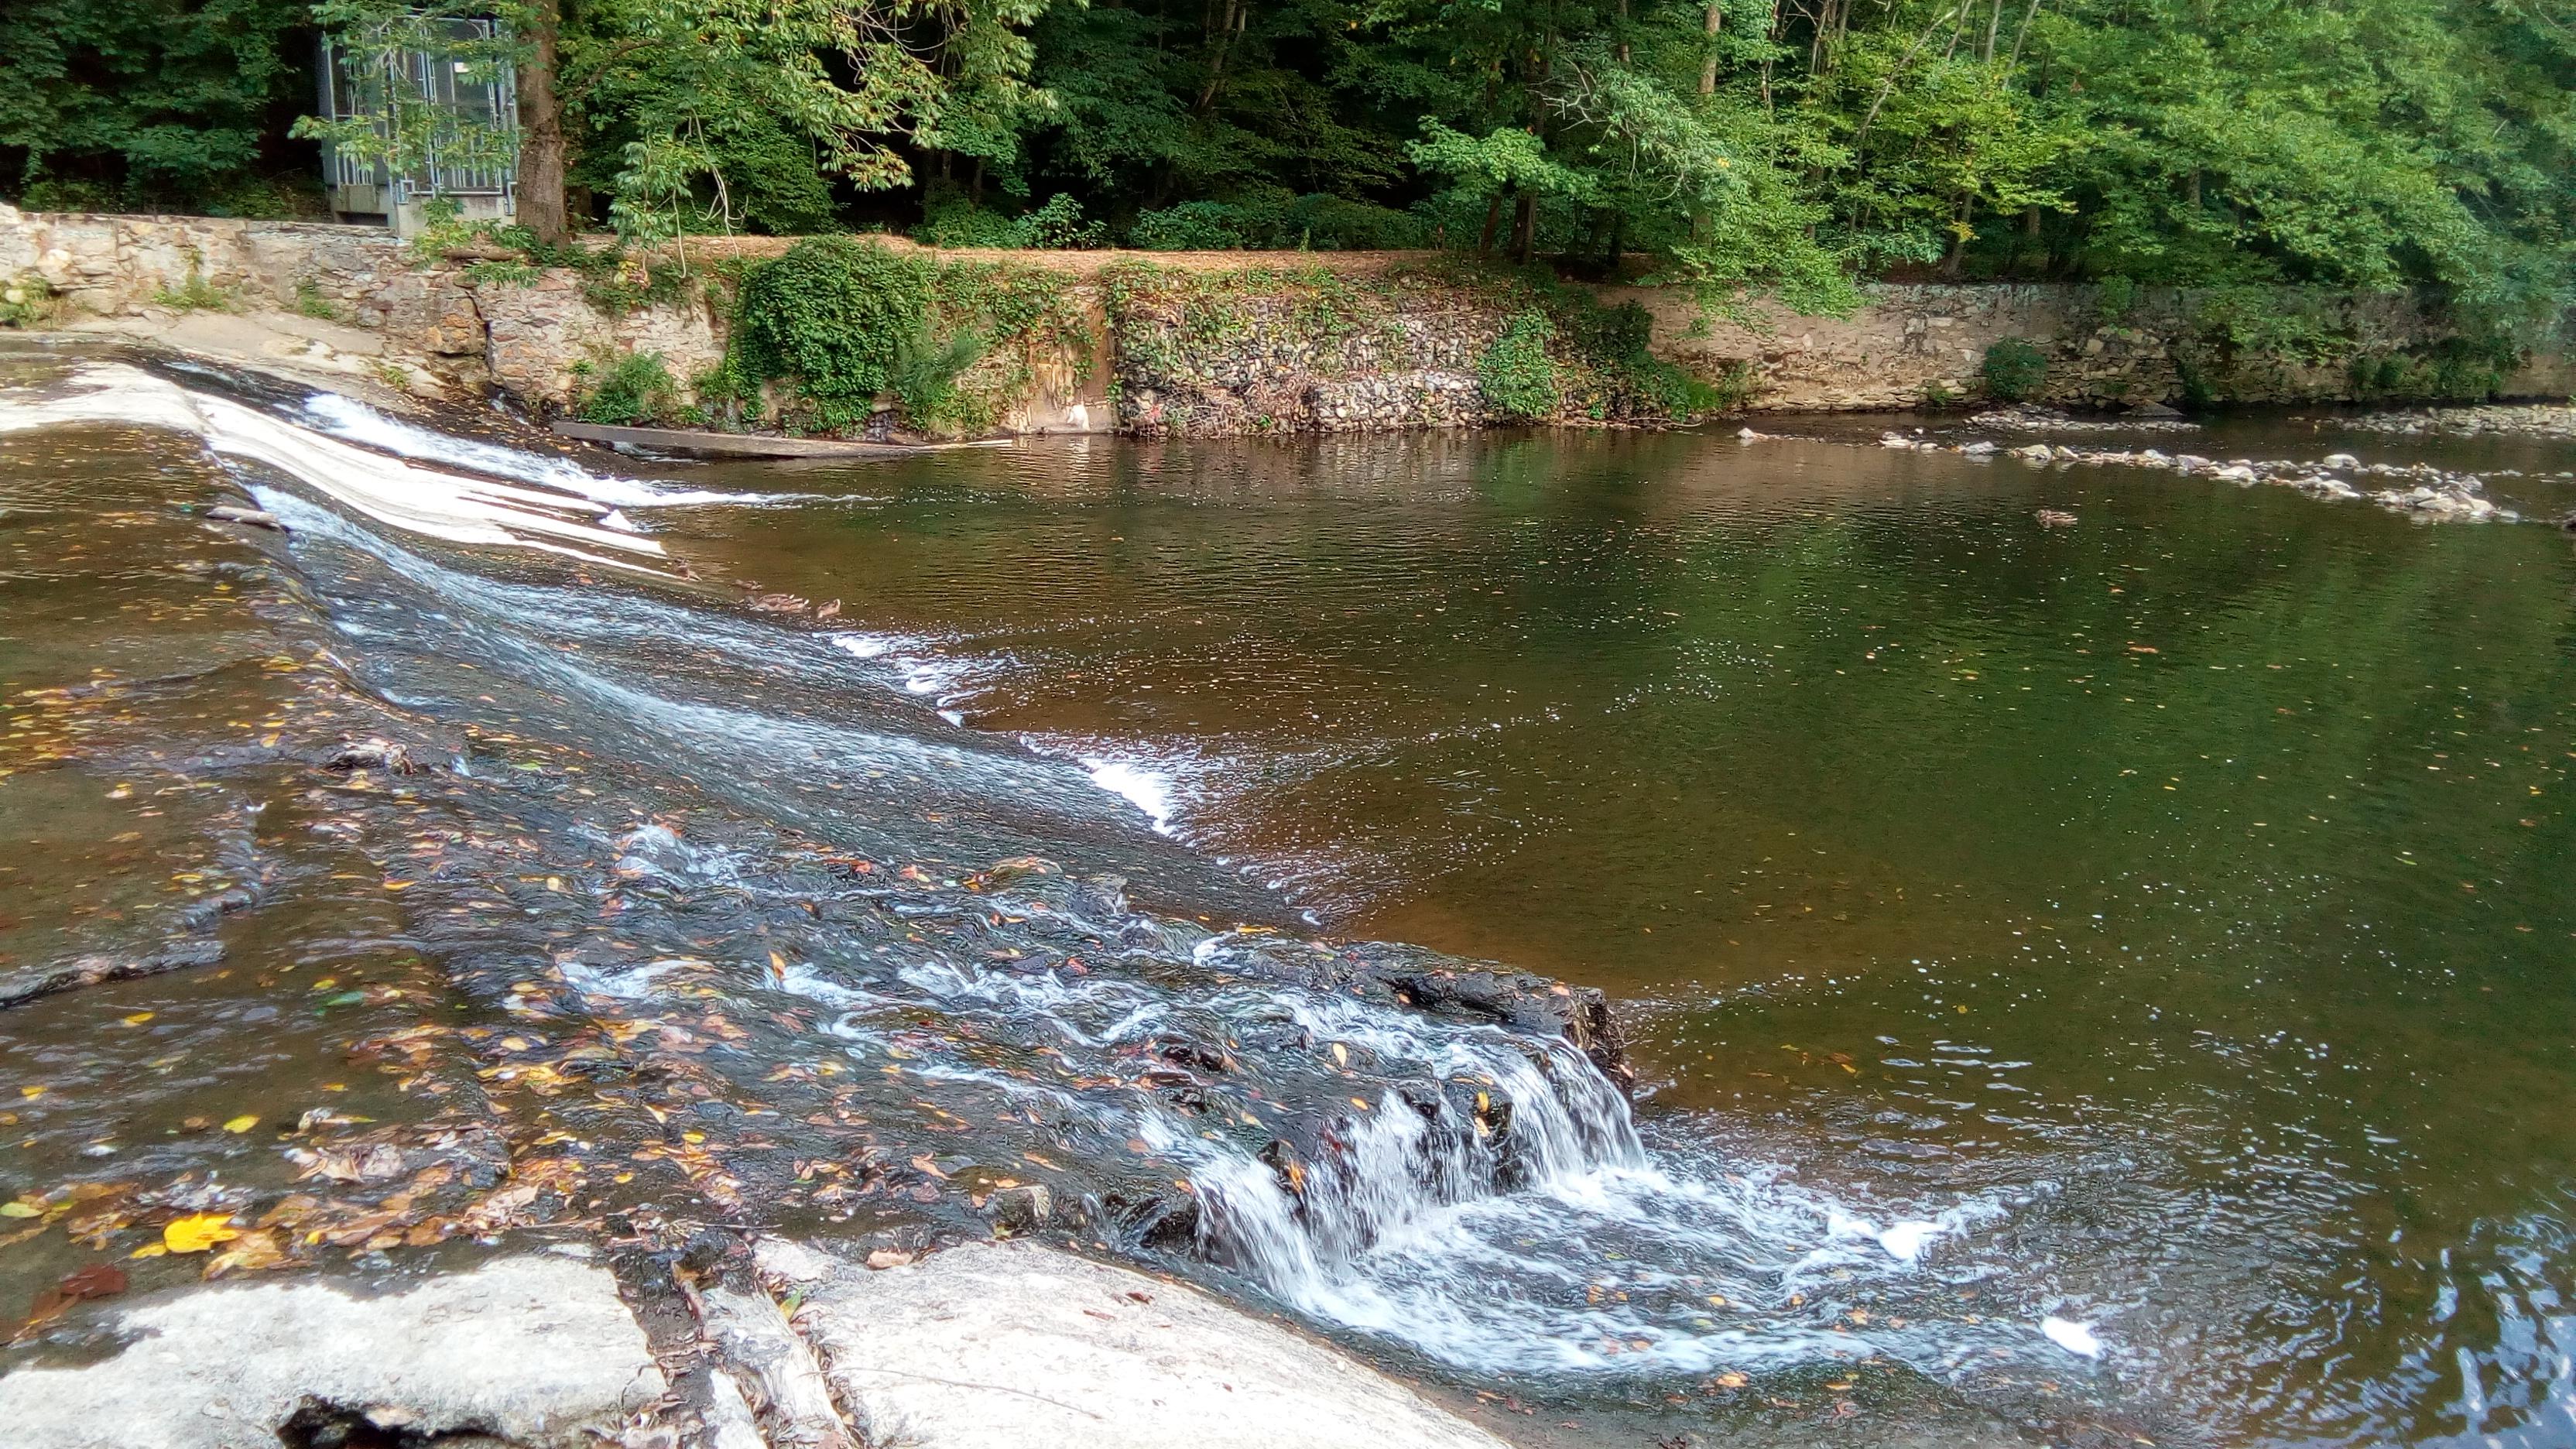 Mini Falls at White Clay Creek by Ashraf Chowdhury